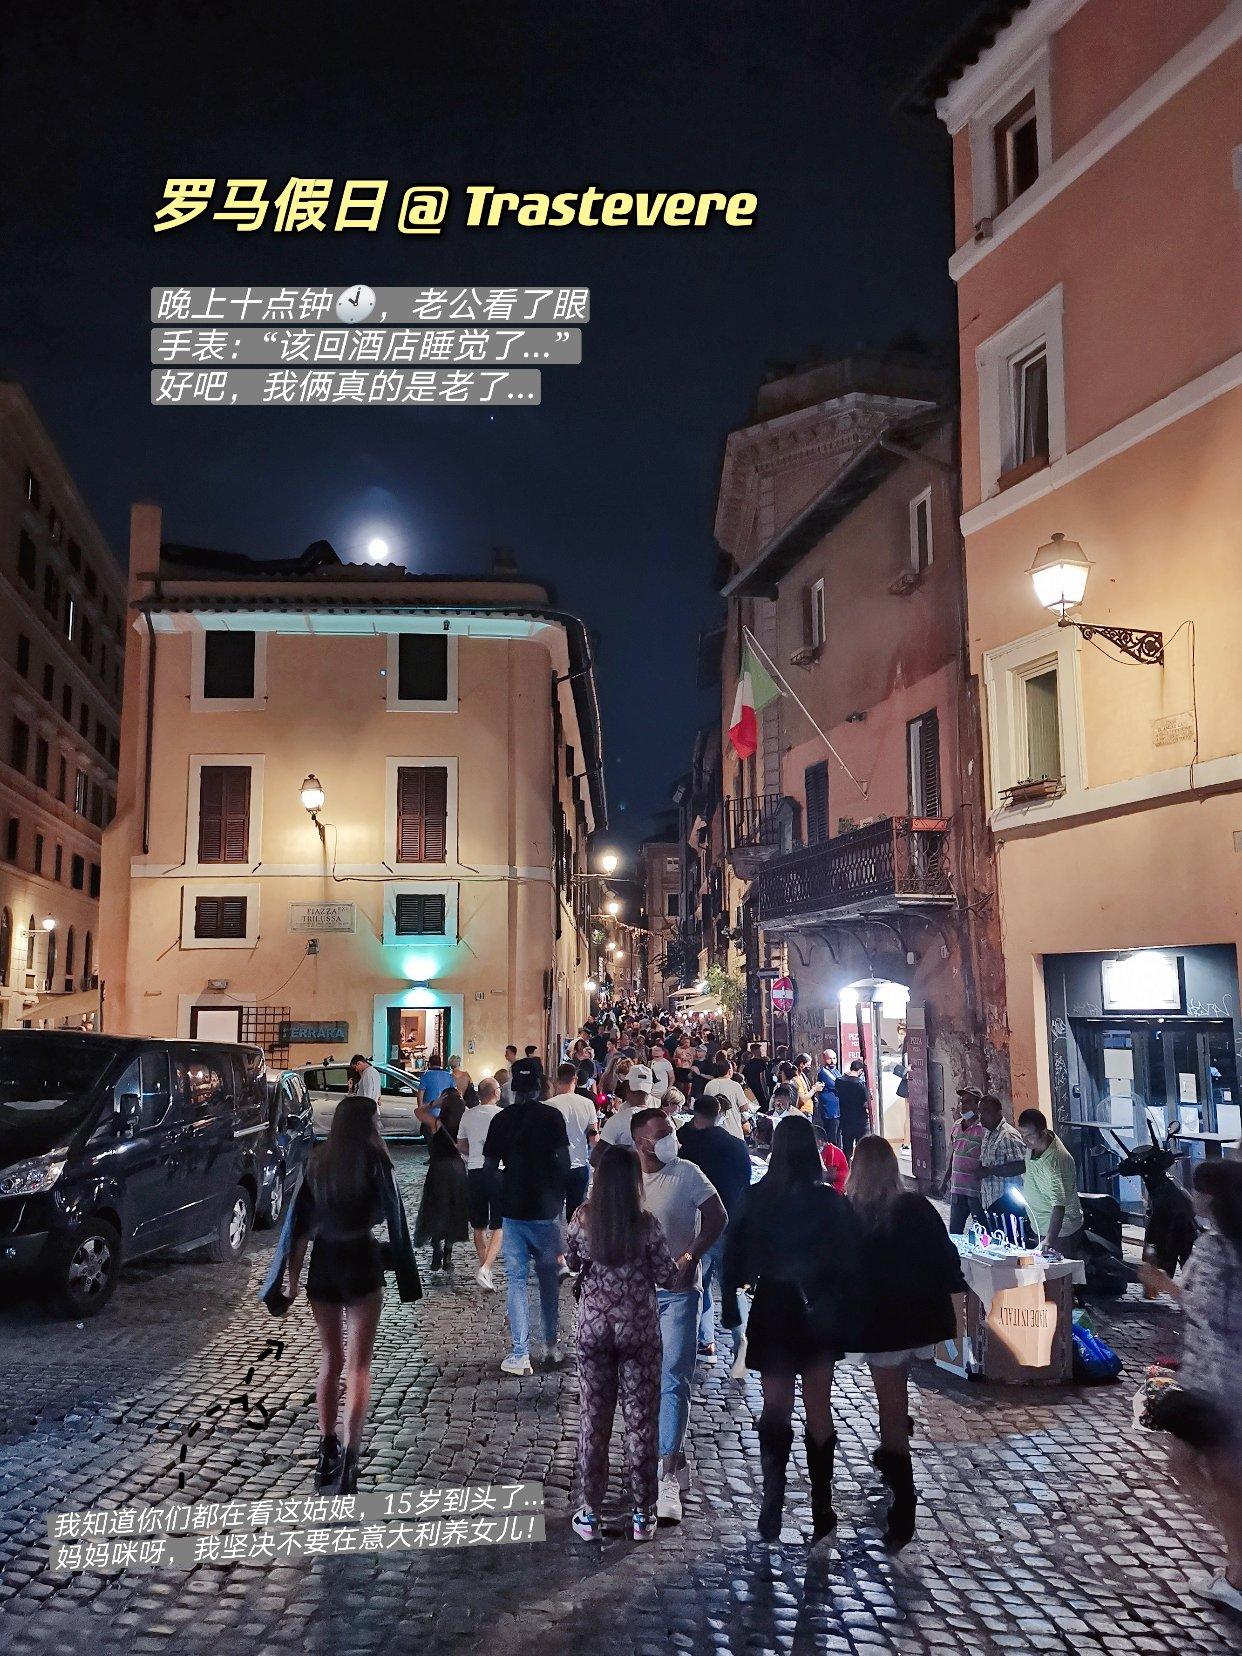 2021年9月18日,星期六,🇮🇹罗马/下。